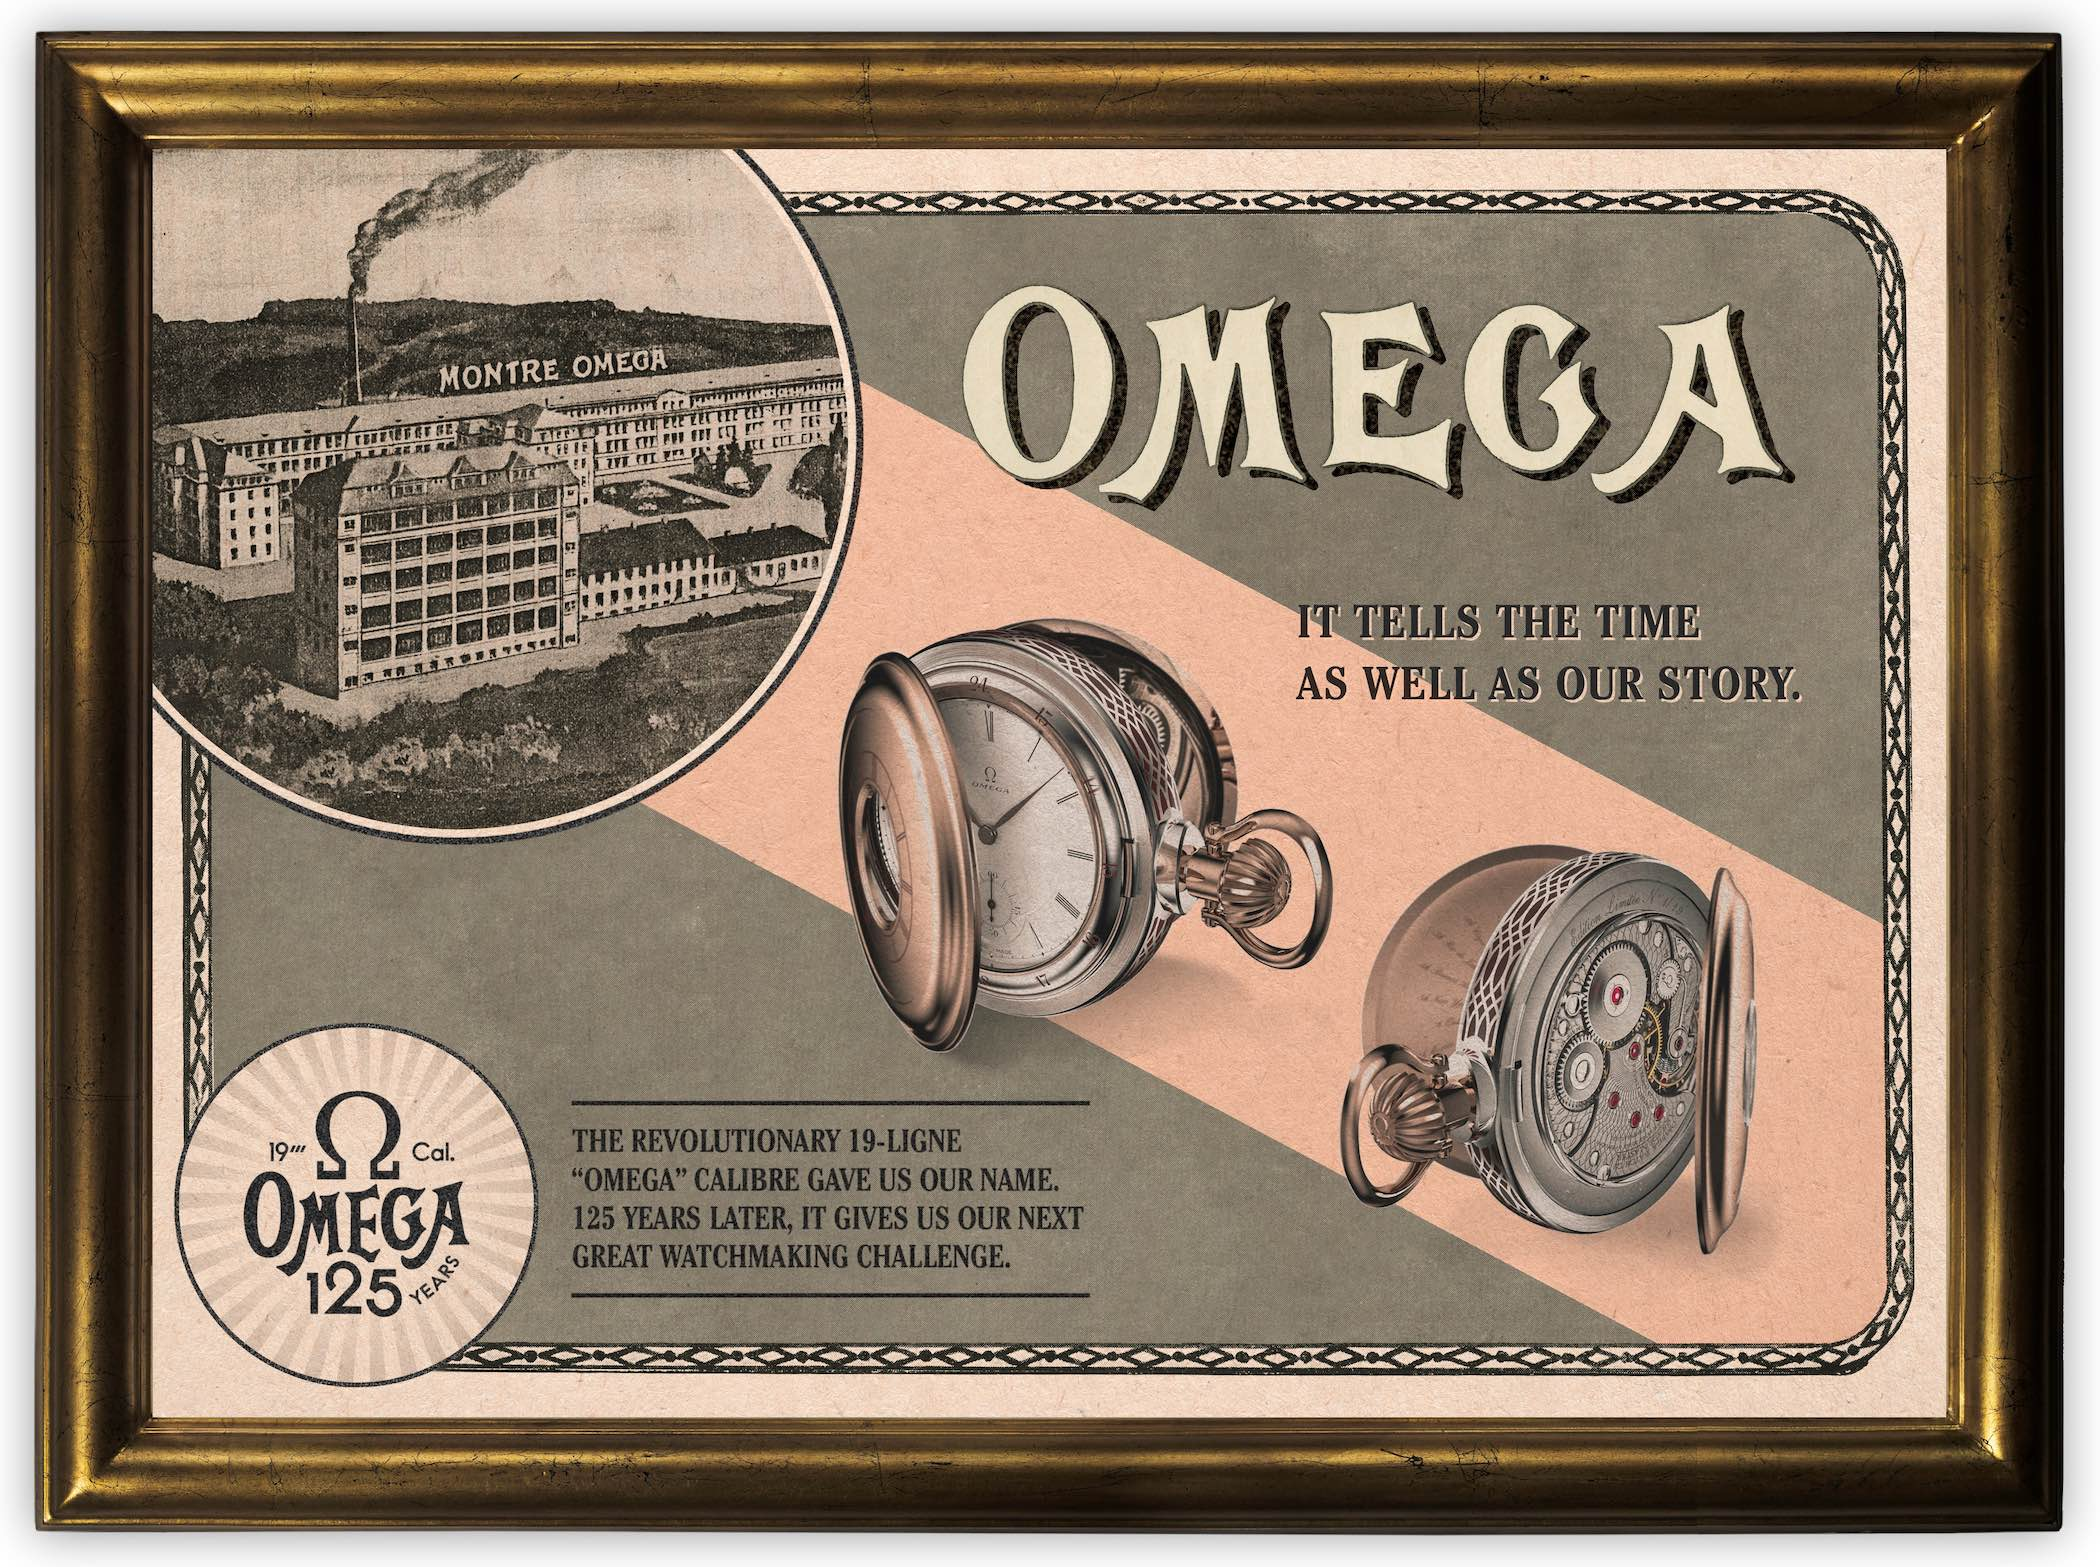 The Reborn Pocket Watch 19-ligne calibre Omega 125th anniversary - 1